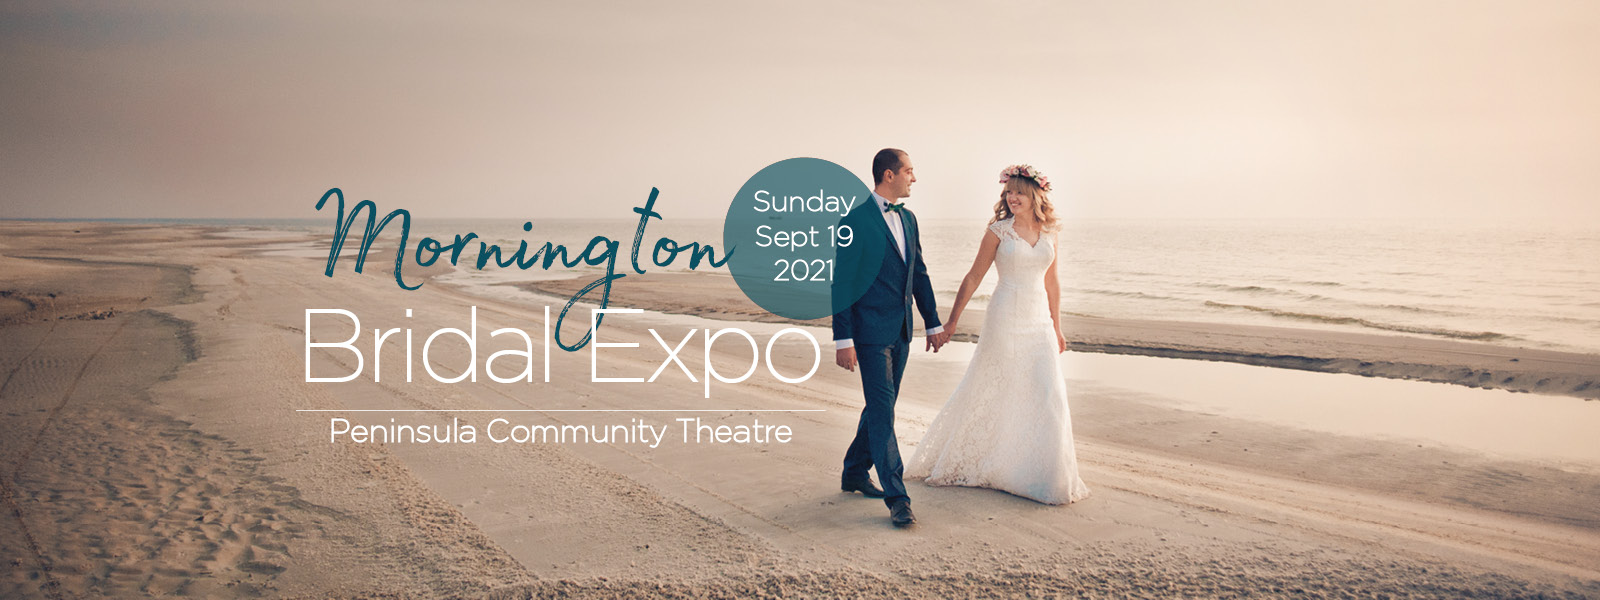 Mornington Bridal Expo - 19th September 2021